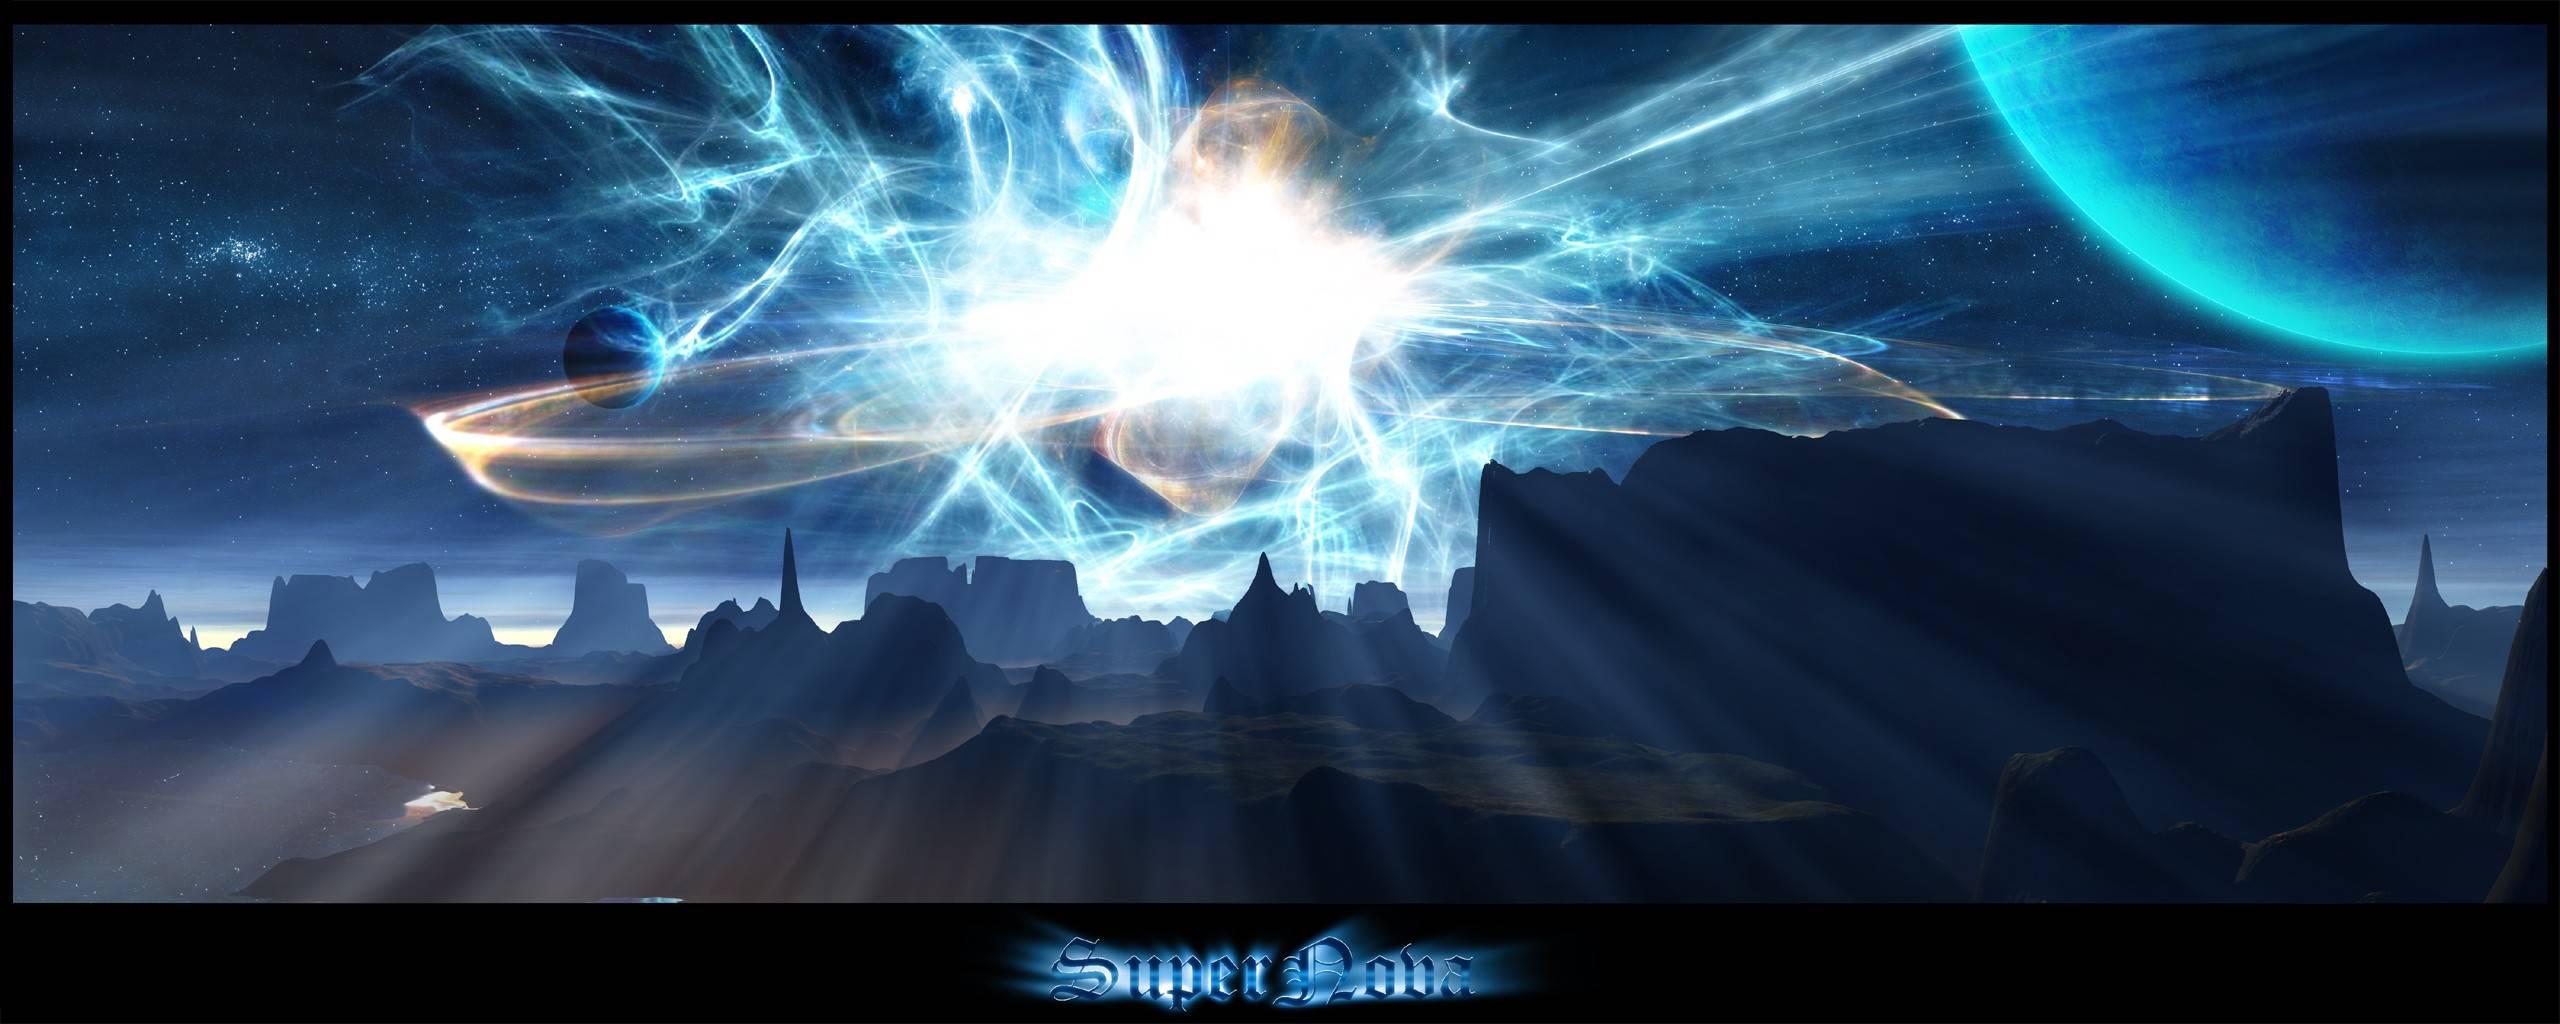 supernova desktop wallpaper - photo #33